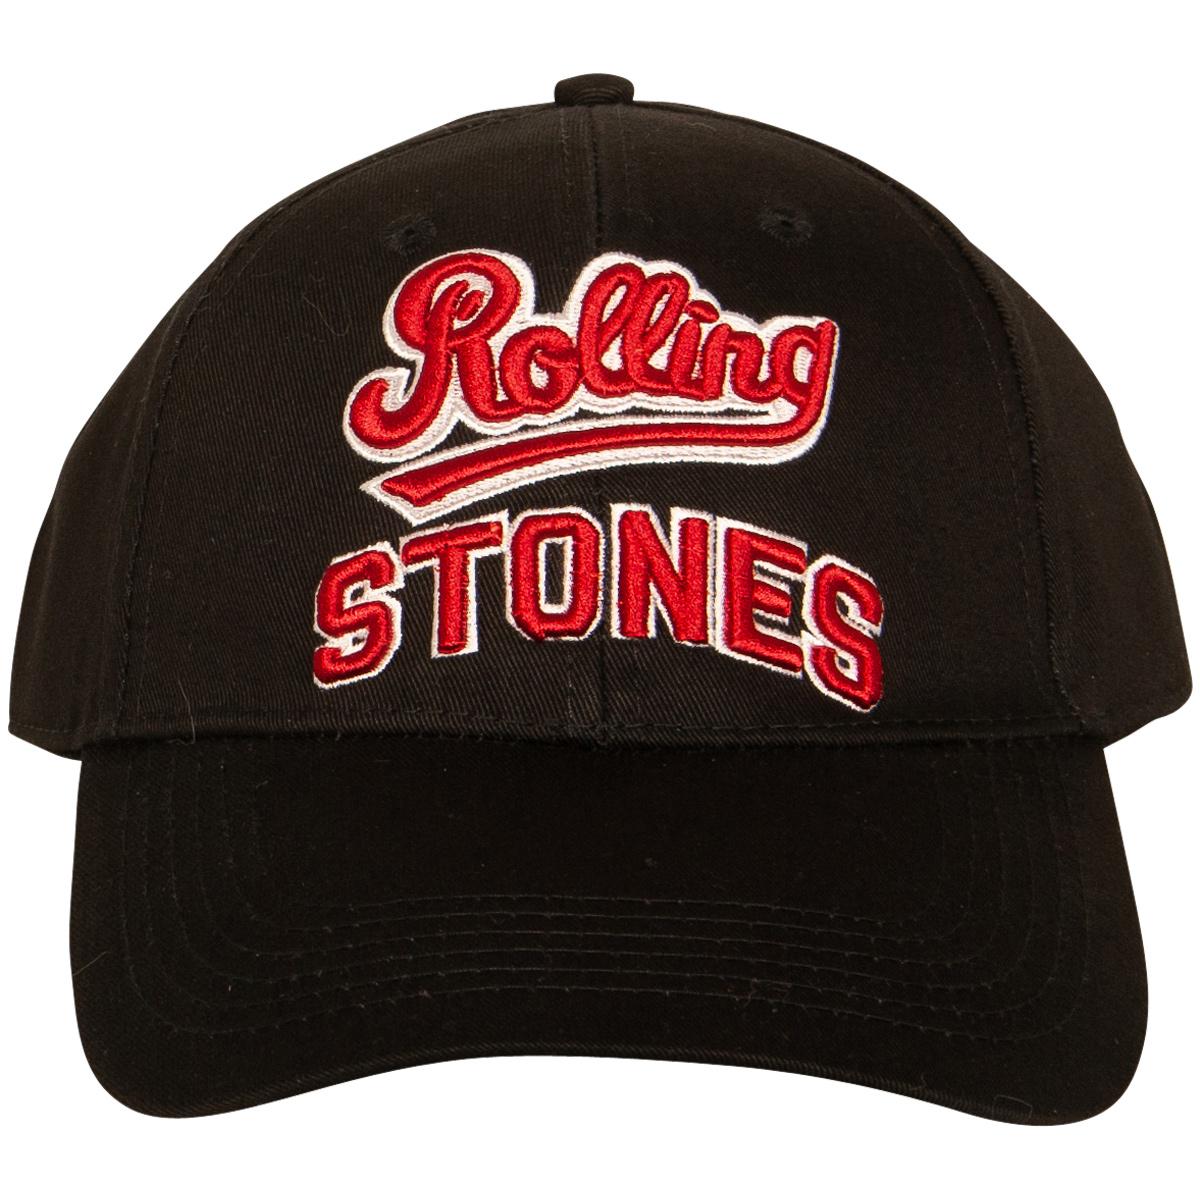 816454d3a The Rolling Stones - Baseball Cap Team Logo - black